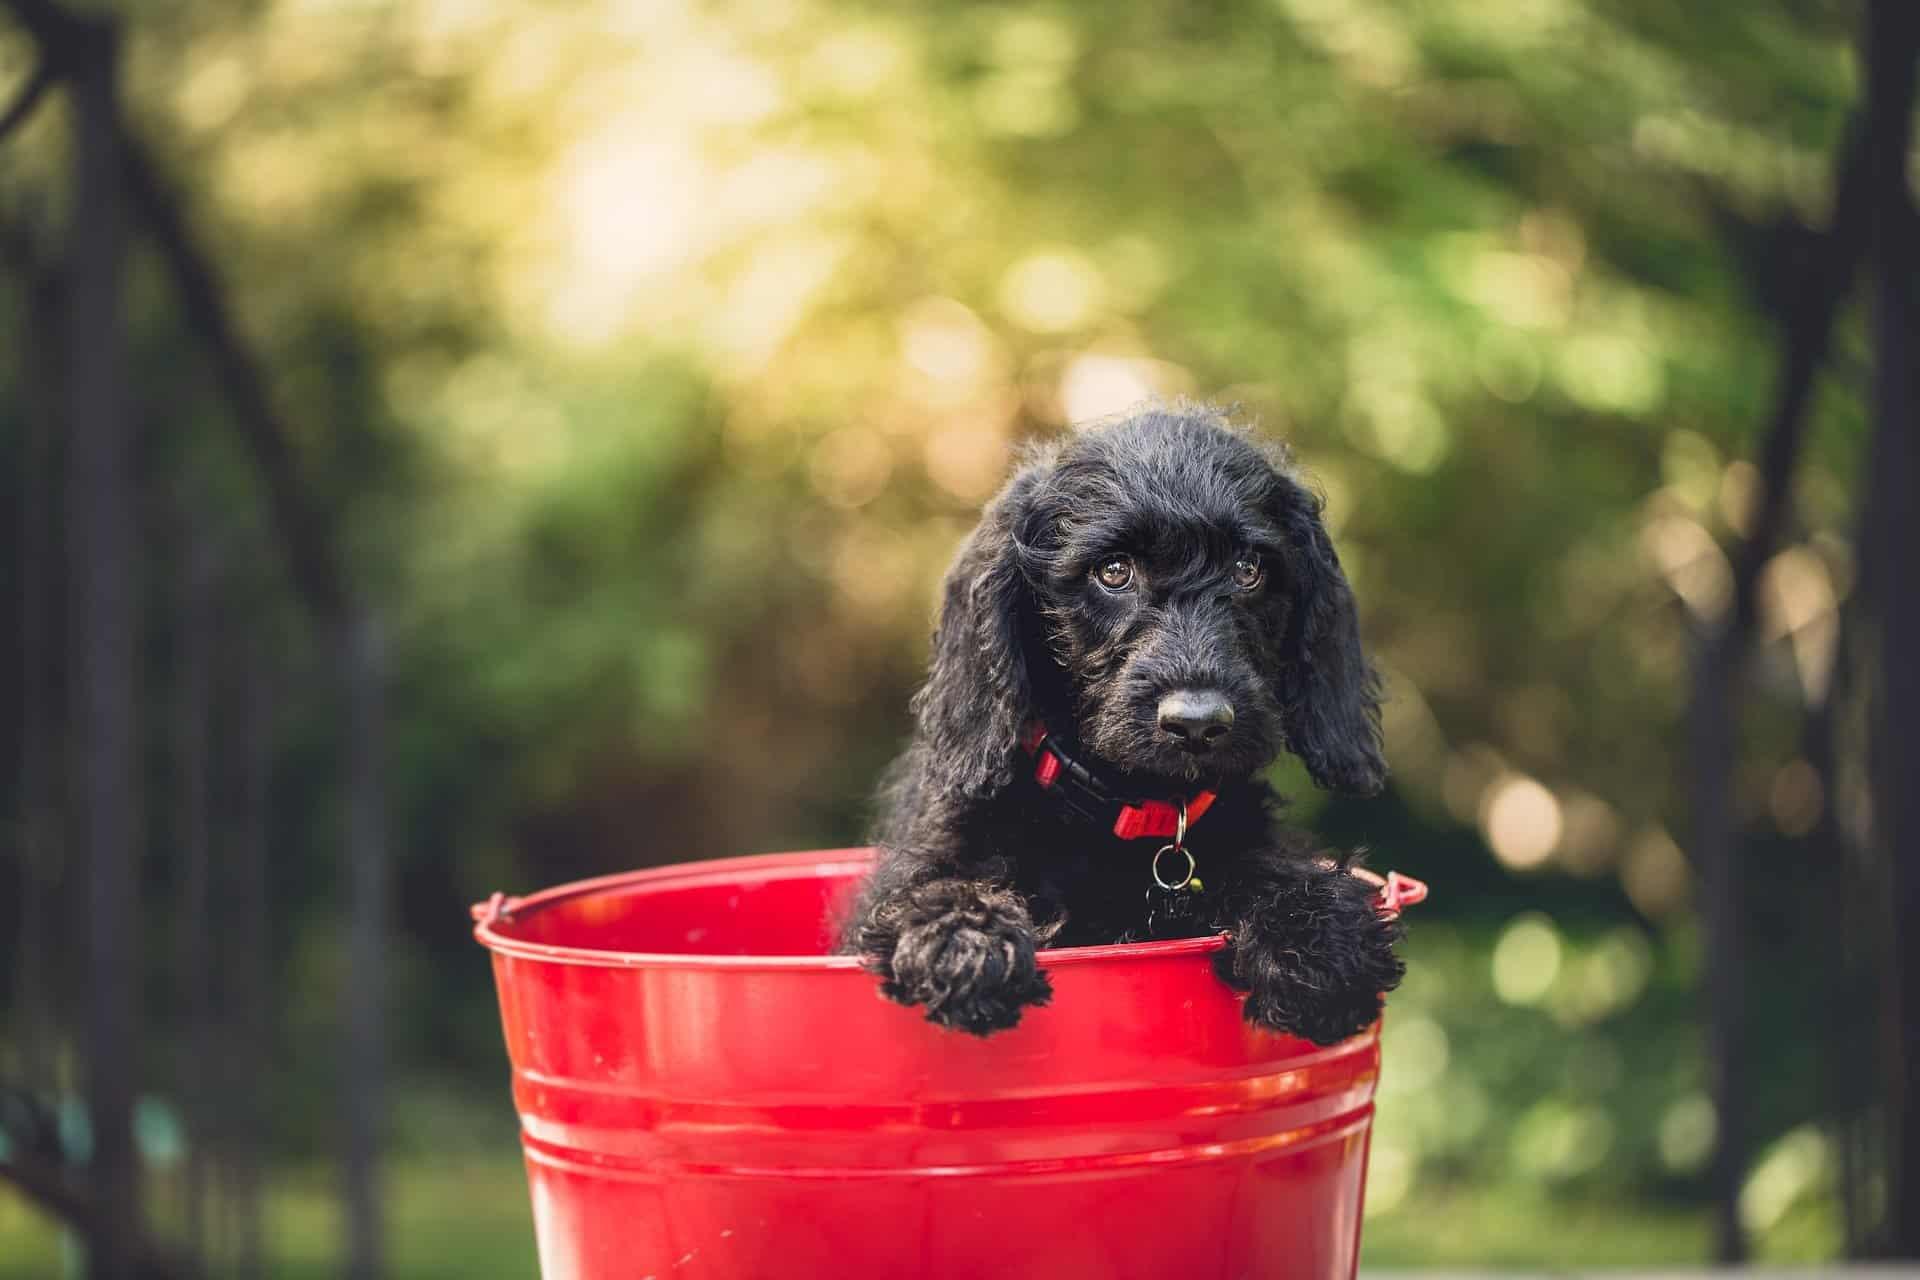 Quickest Way to Potty Train a Puppy